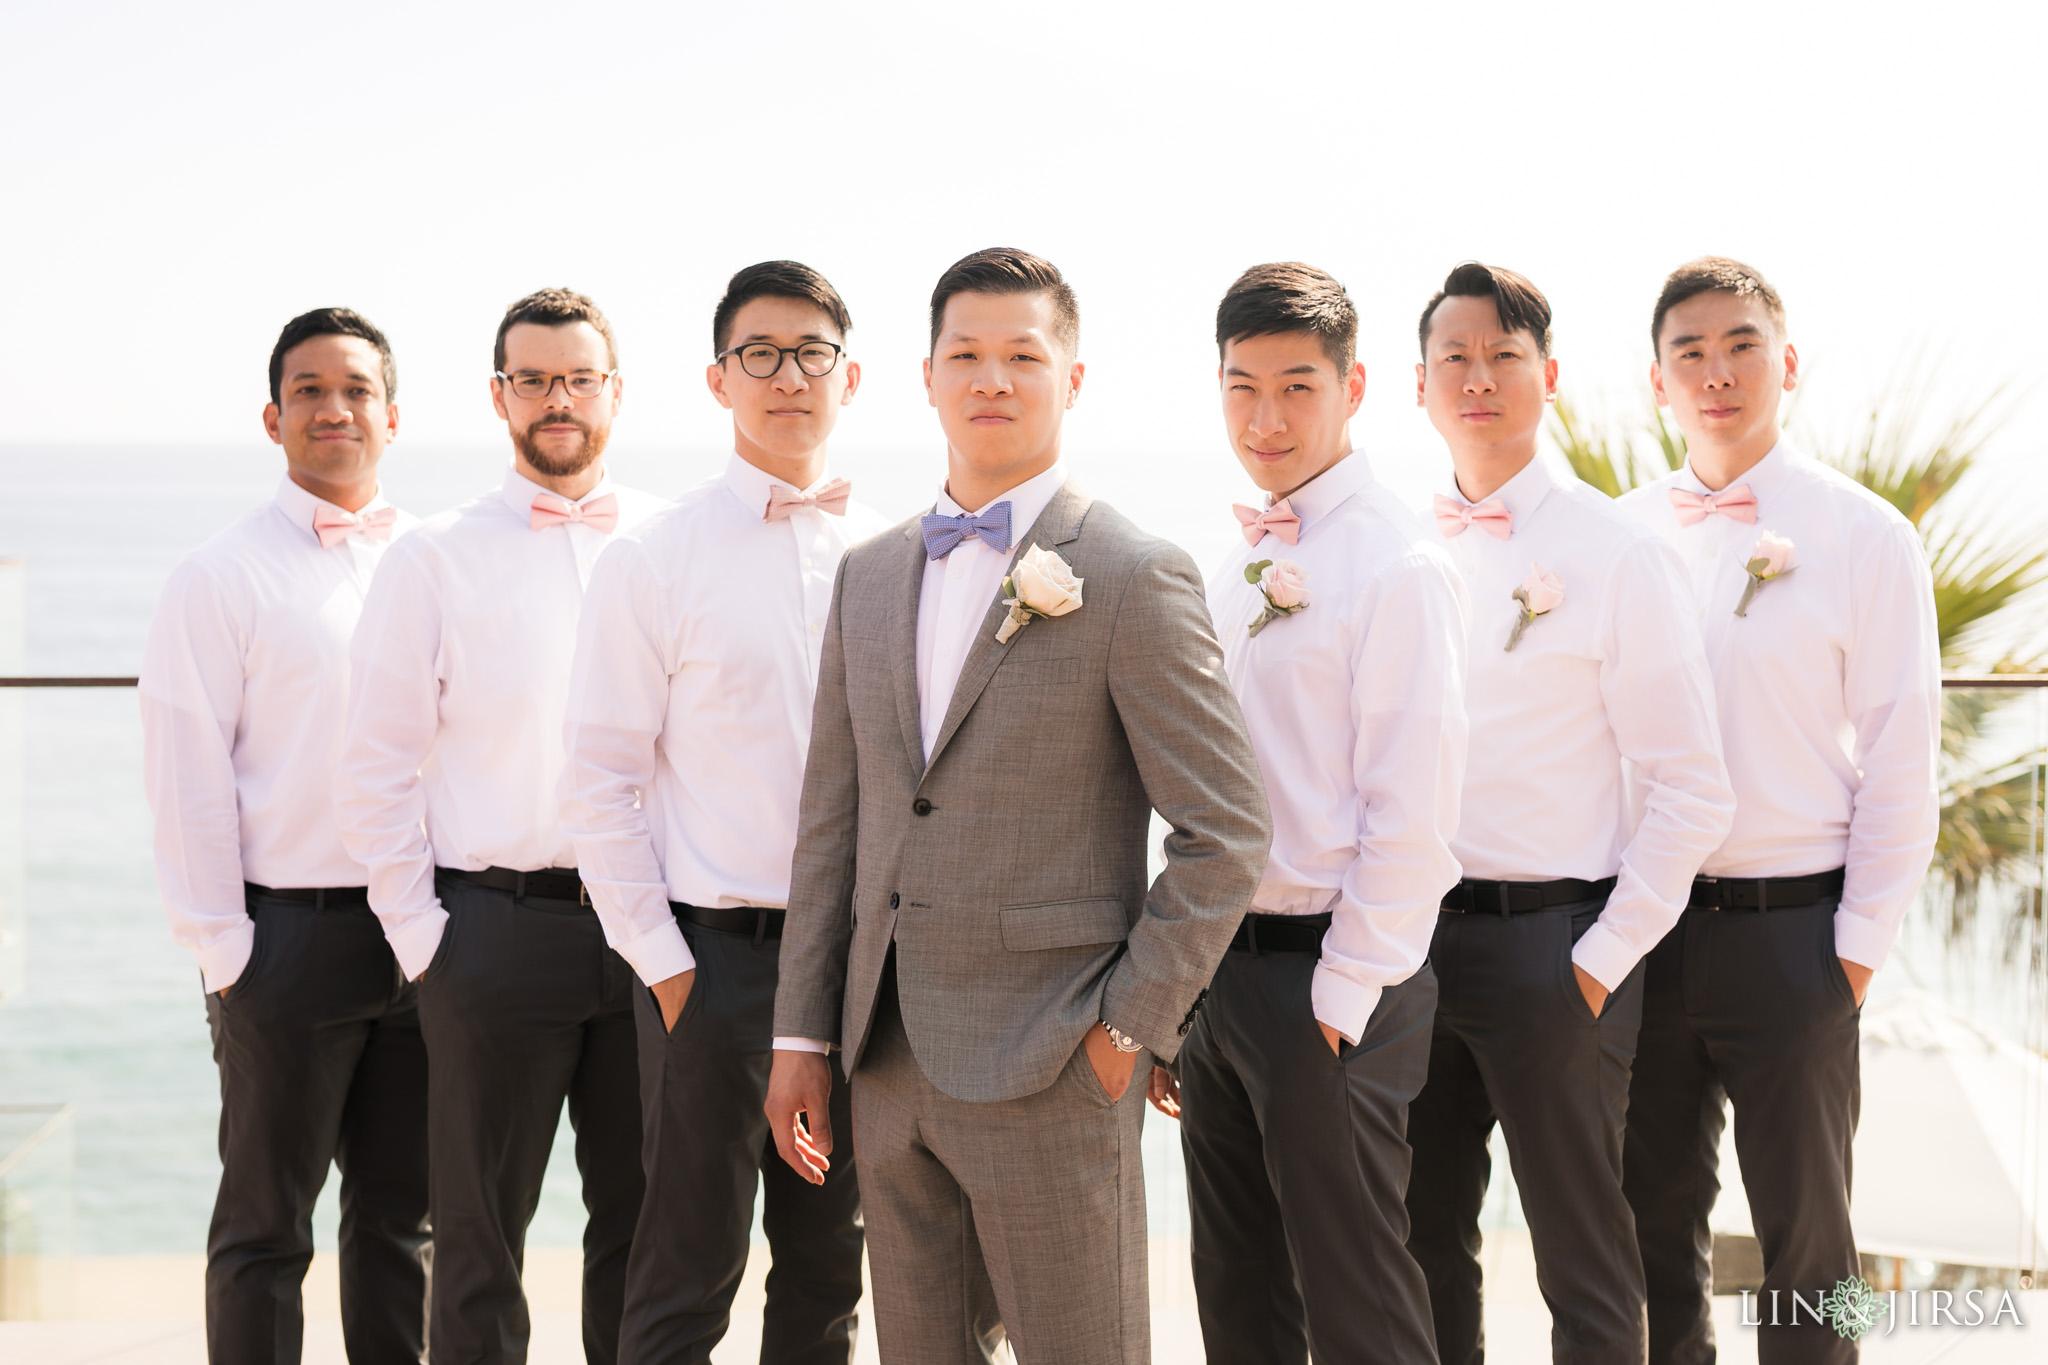 009 surf and sand resort laguna beach wedding photography